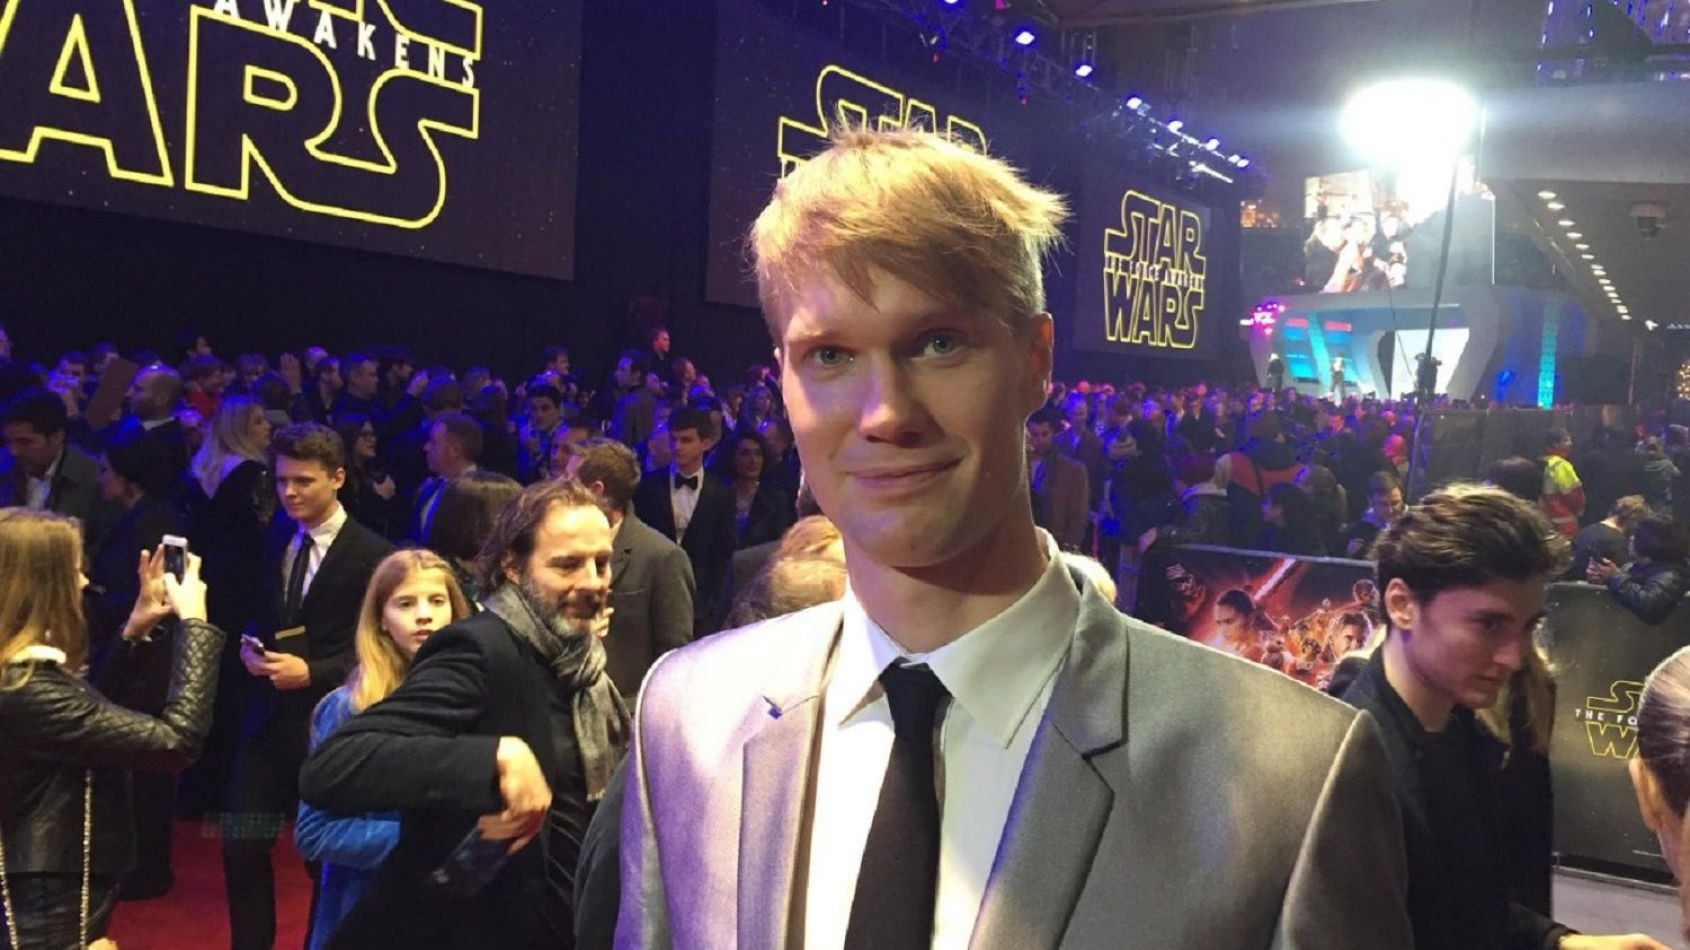 La réaction de Chewbacca (Joonas Suotamo) devant le trailer de Solo